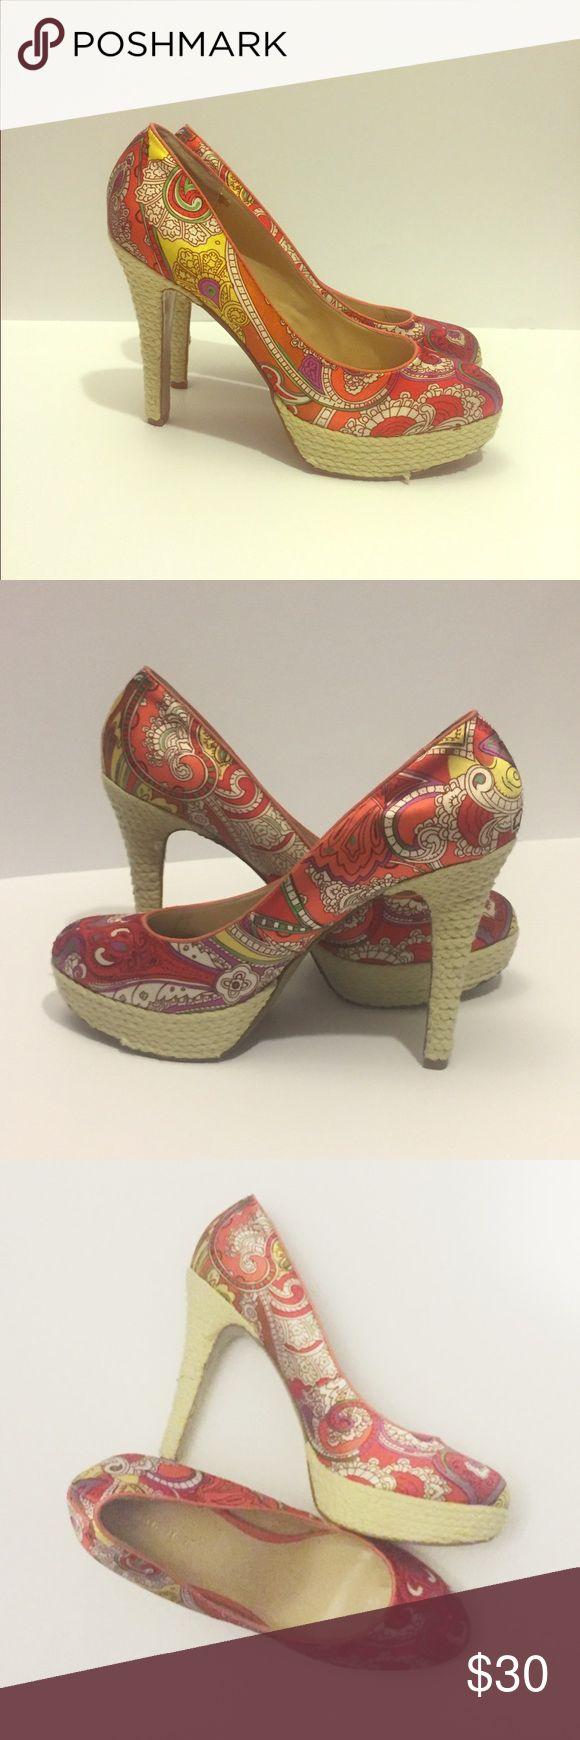 SALE 🎀🎀🎀 Nine West Paisley Pumps Nine West, size 9 1/2, MINIMAL wear on shoes Nine West Shoes Heels